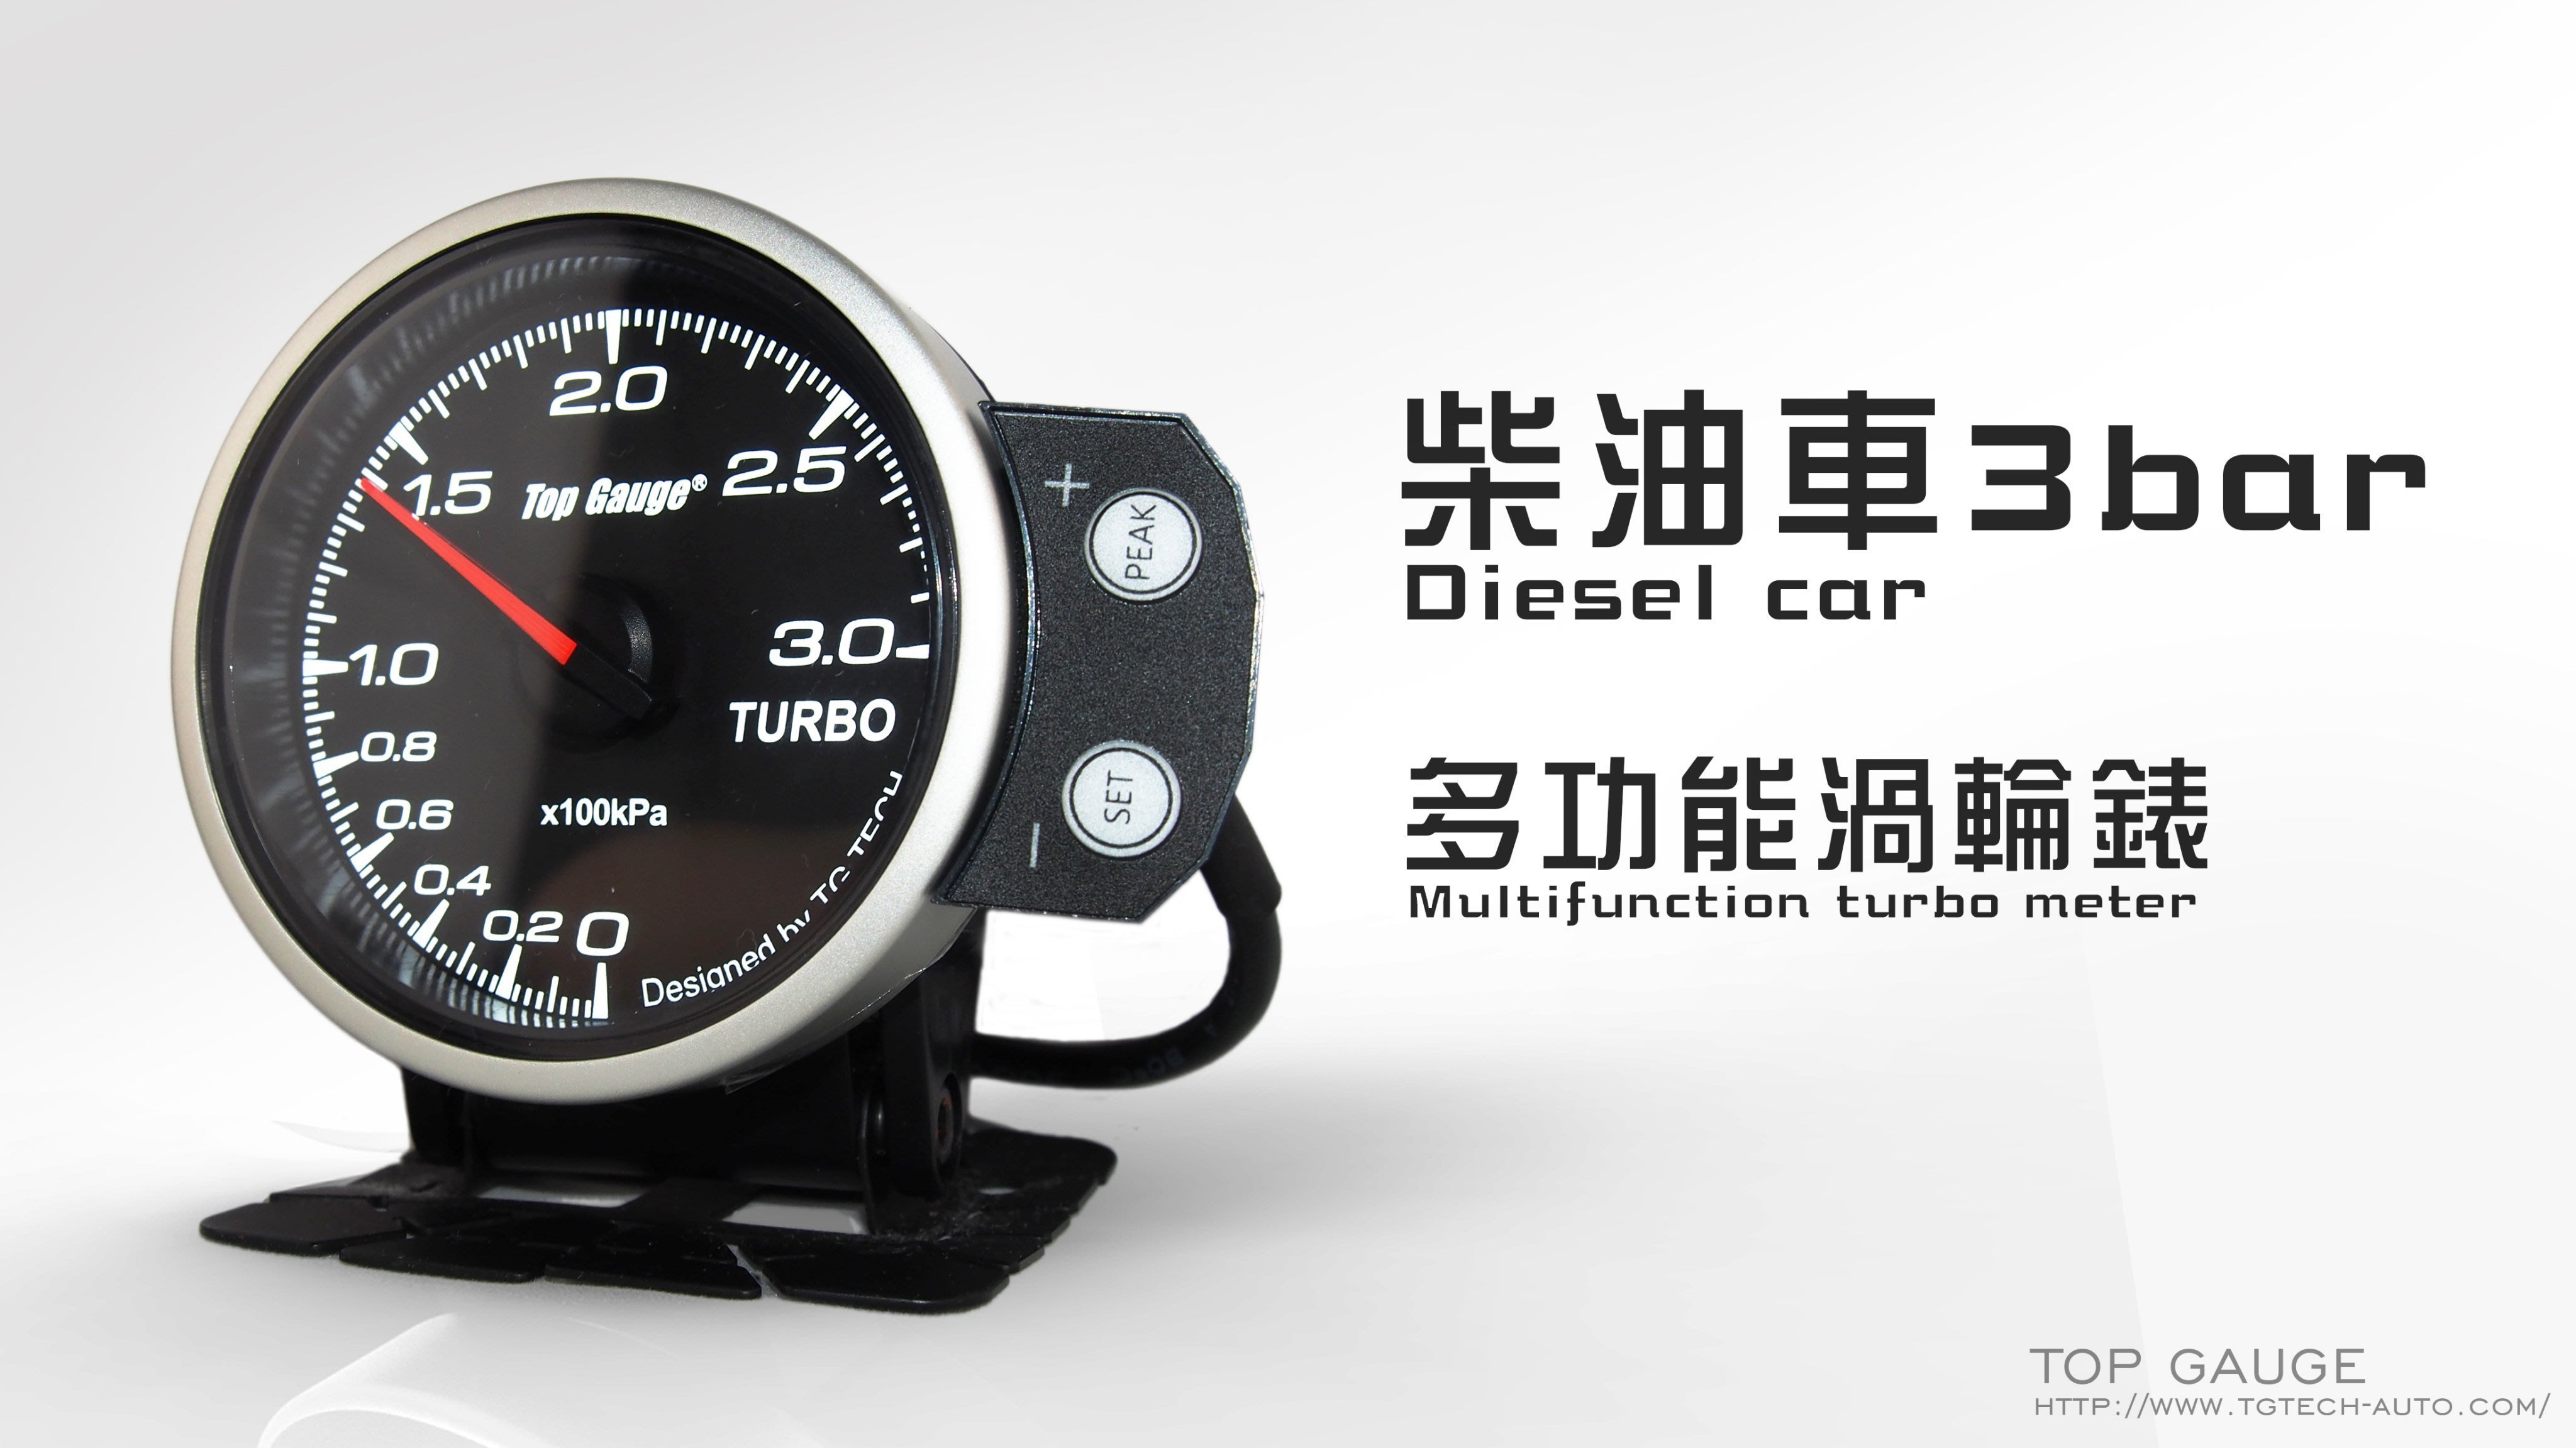 【精宇科技】TDCI HDI TDI FOCUS GOLF MONDEO tucson 柴油車3bar 專用多功能渦輪錶